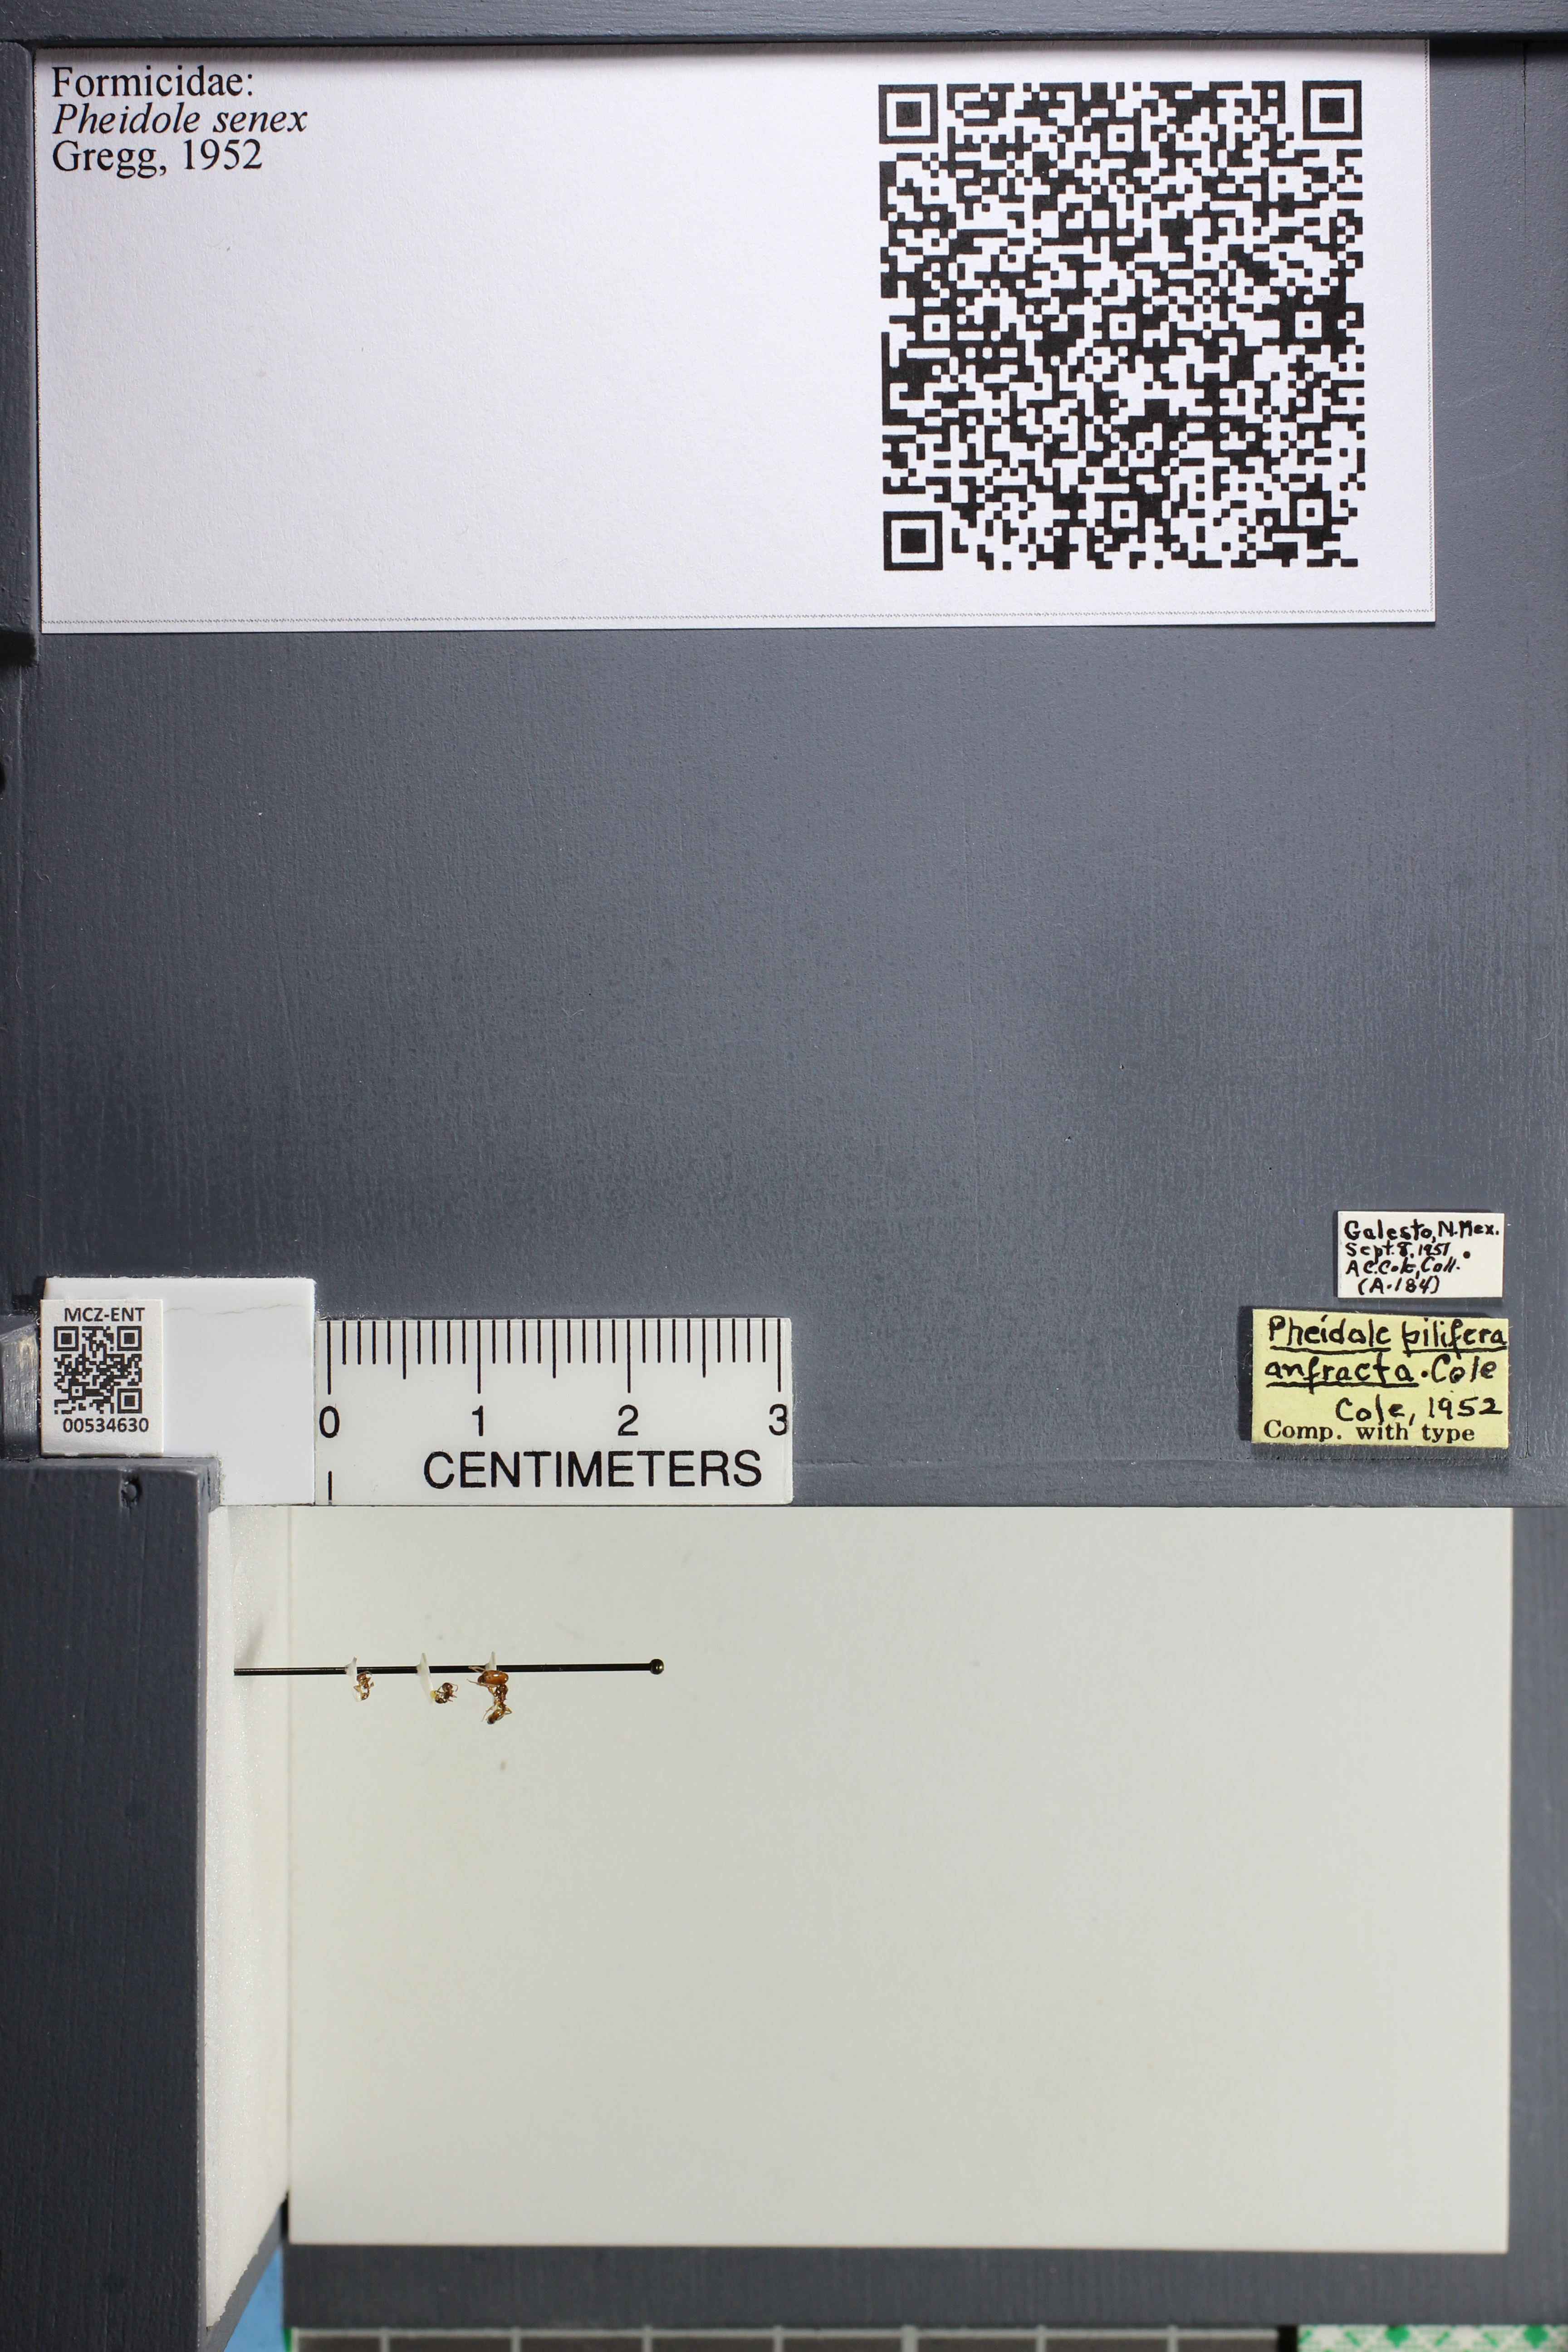 Media of type image, MCZ:Ent:534630 Identified as Pheidole senex.